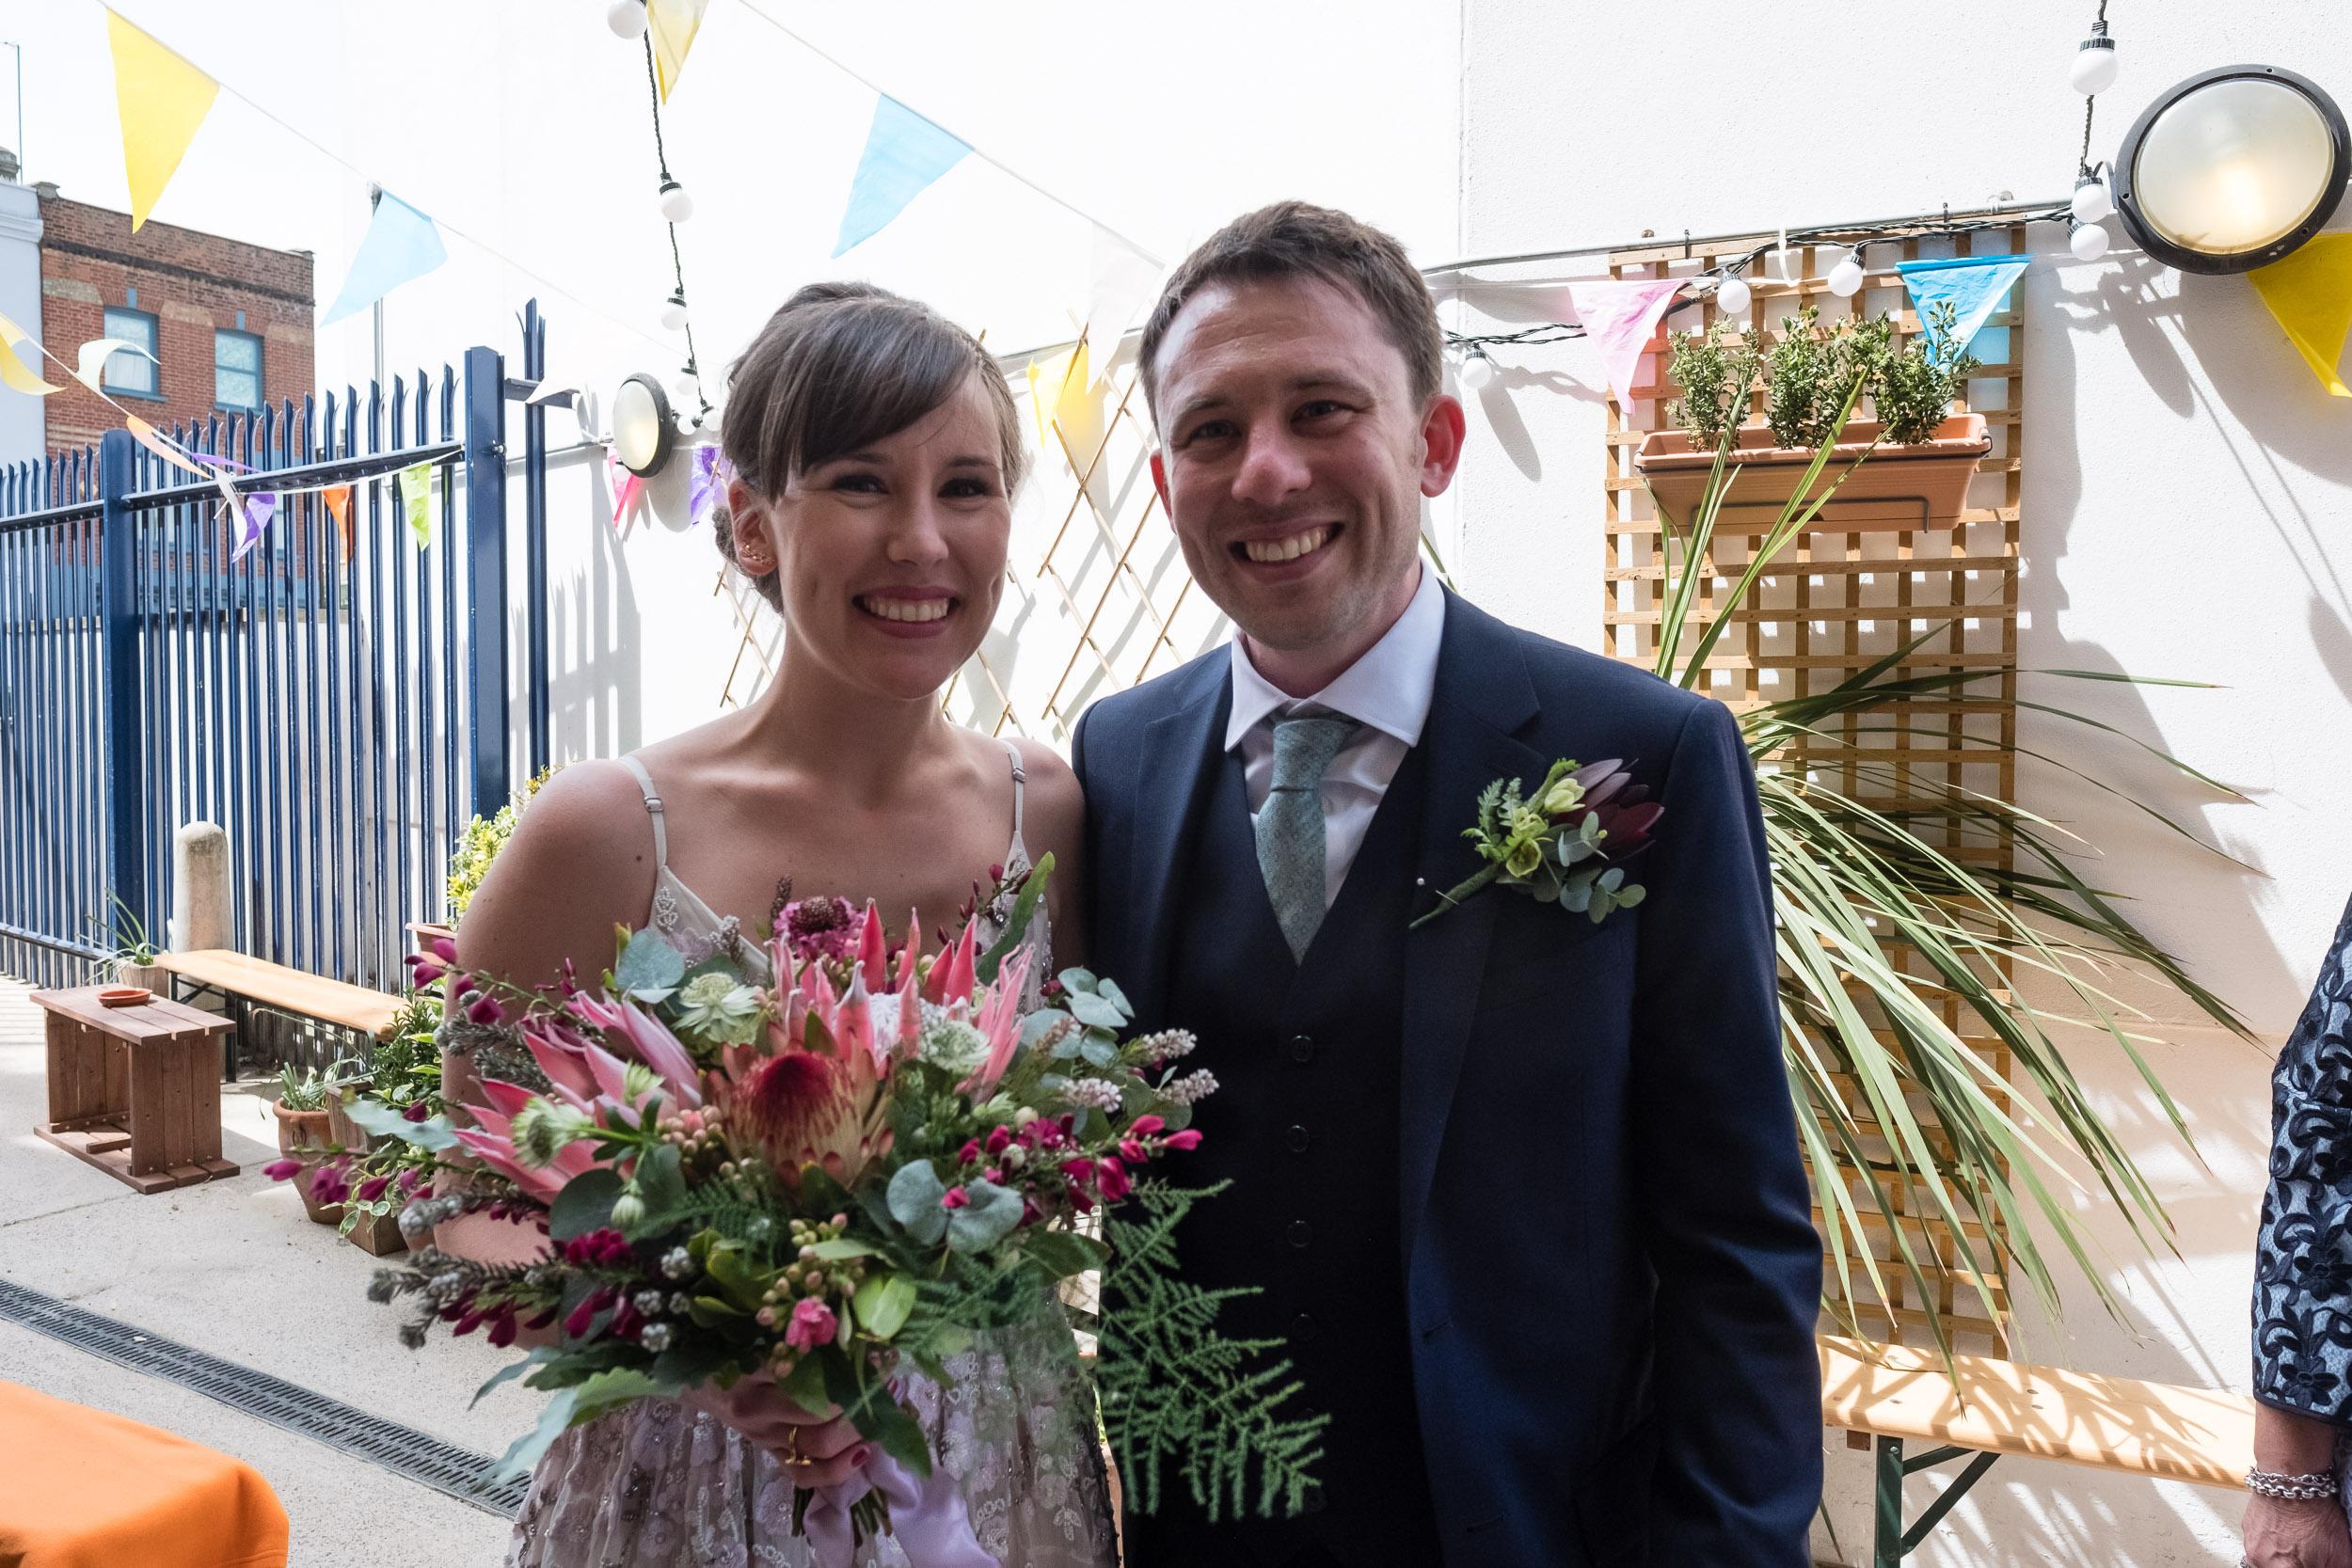 brockwell-lido-brixton-herne-hill-wedding-052.jpg